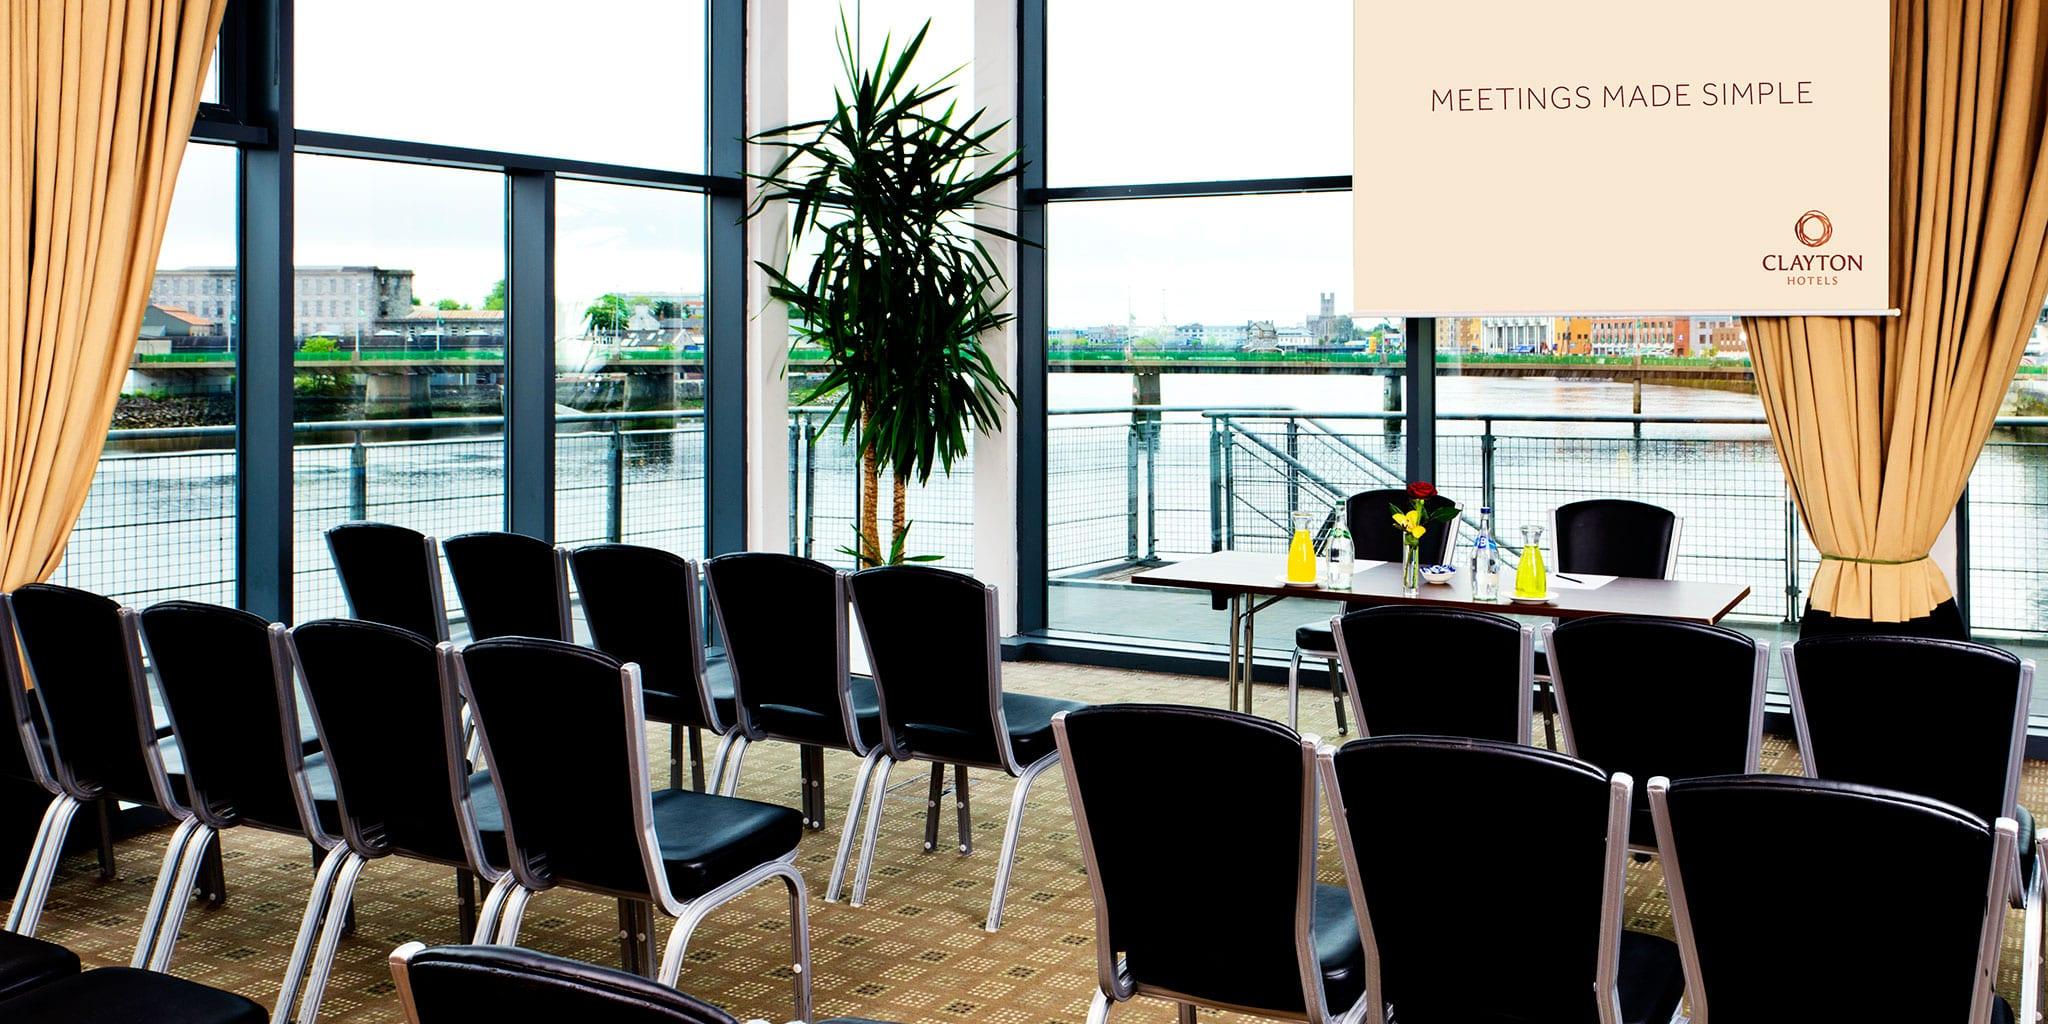 presentation-meeting-at-Clayton-Hotel-Limerick